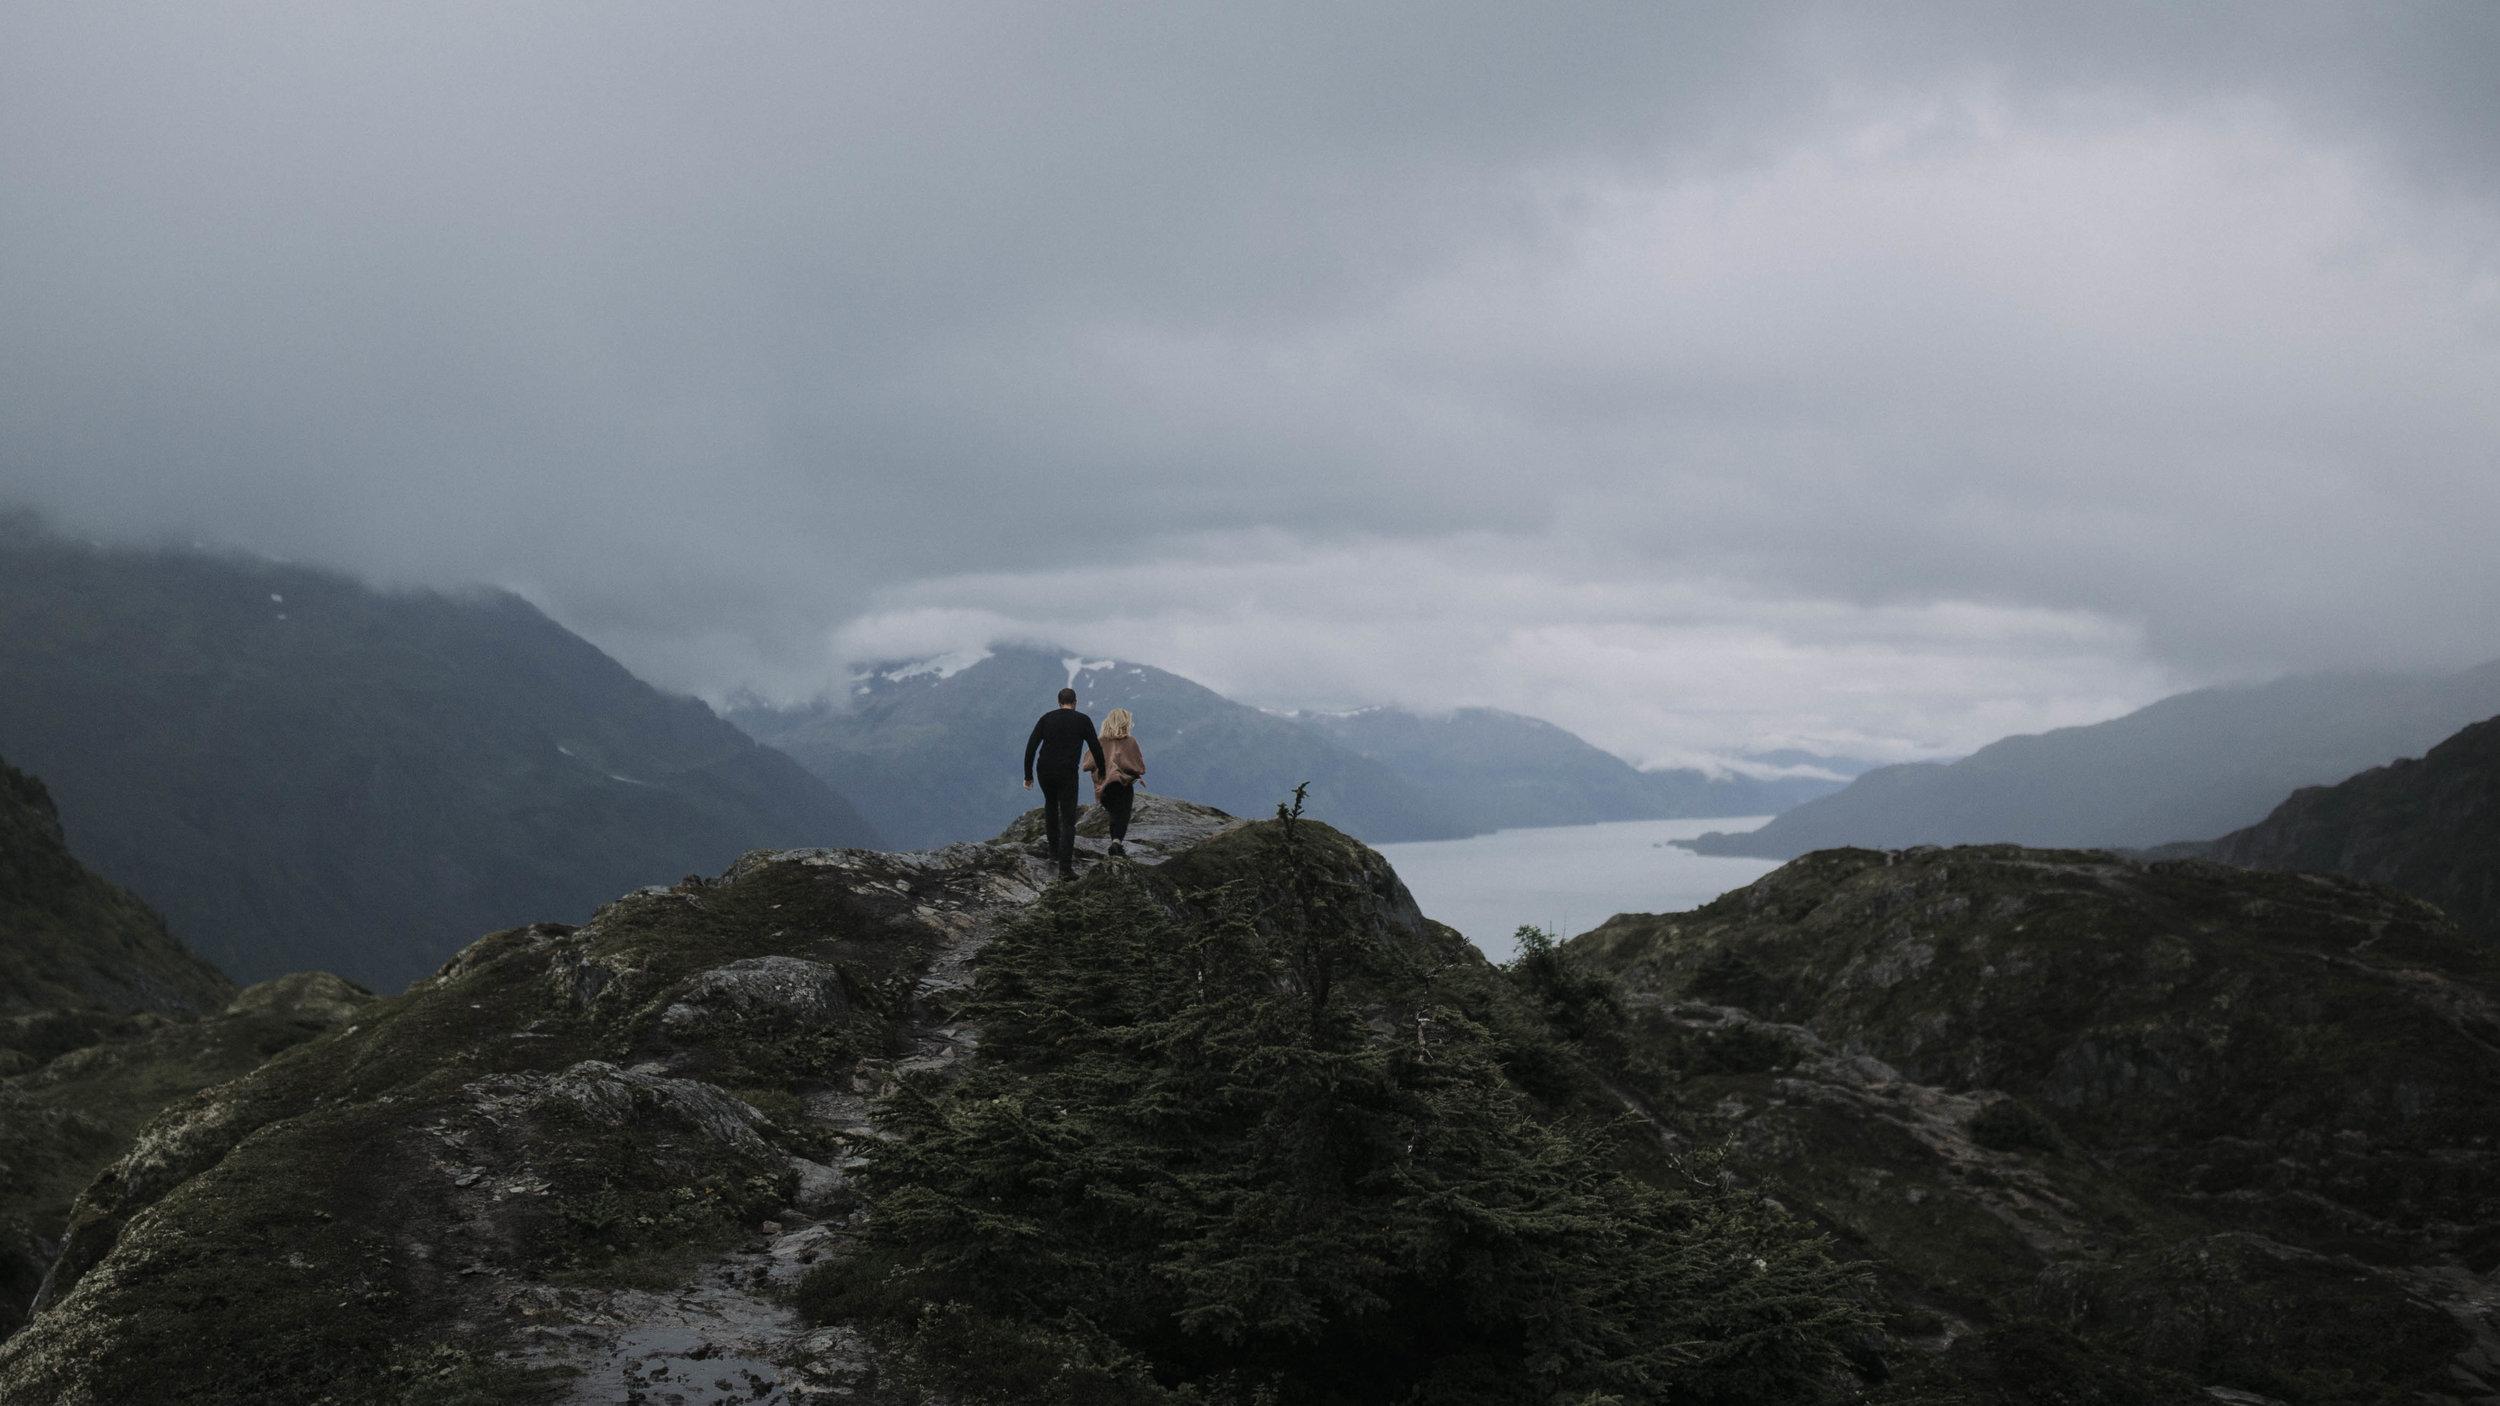 ariel-lynn-alaskan-mountain-couples-session-12.jpg